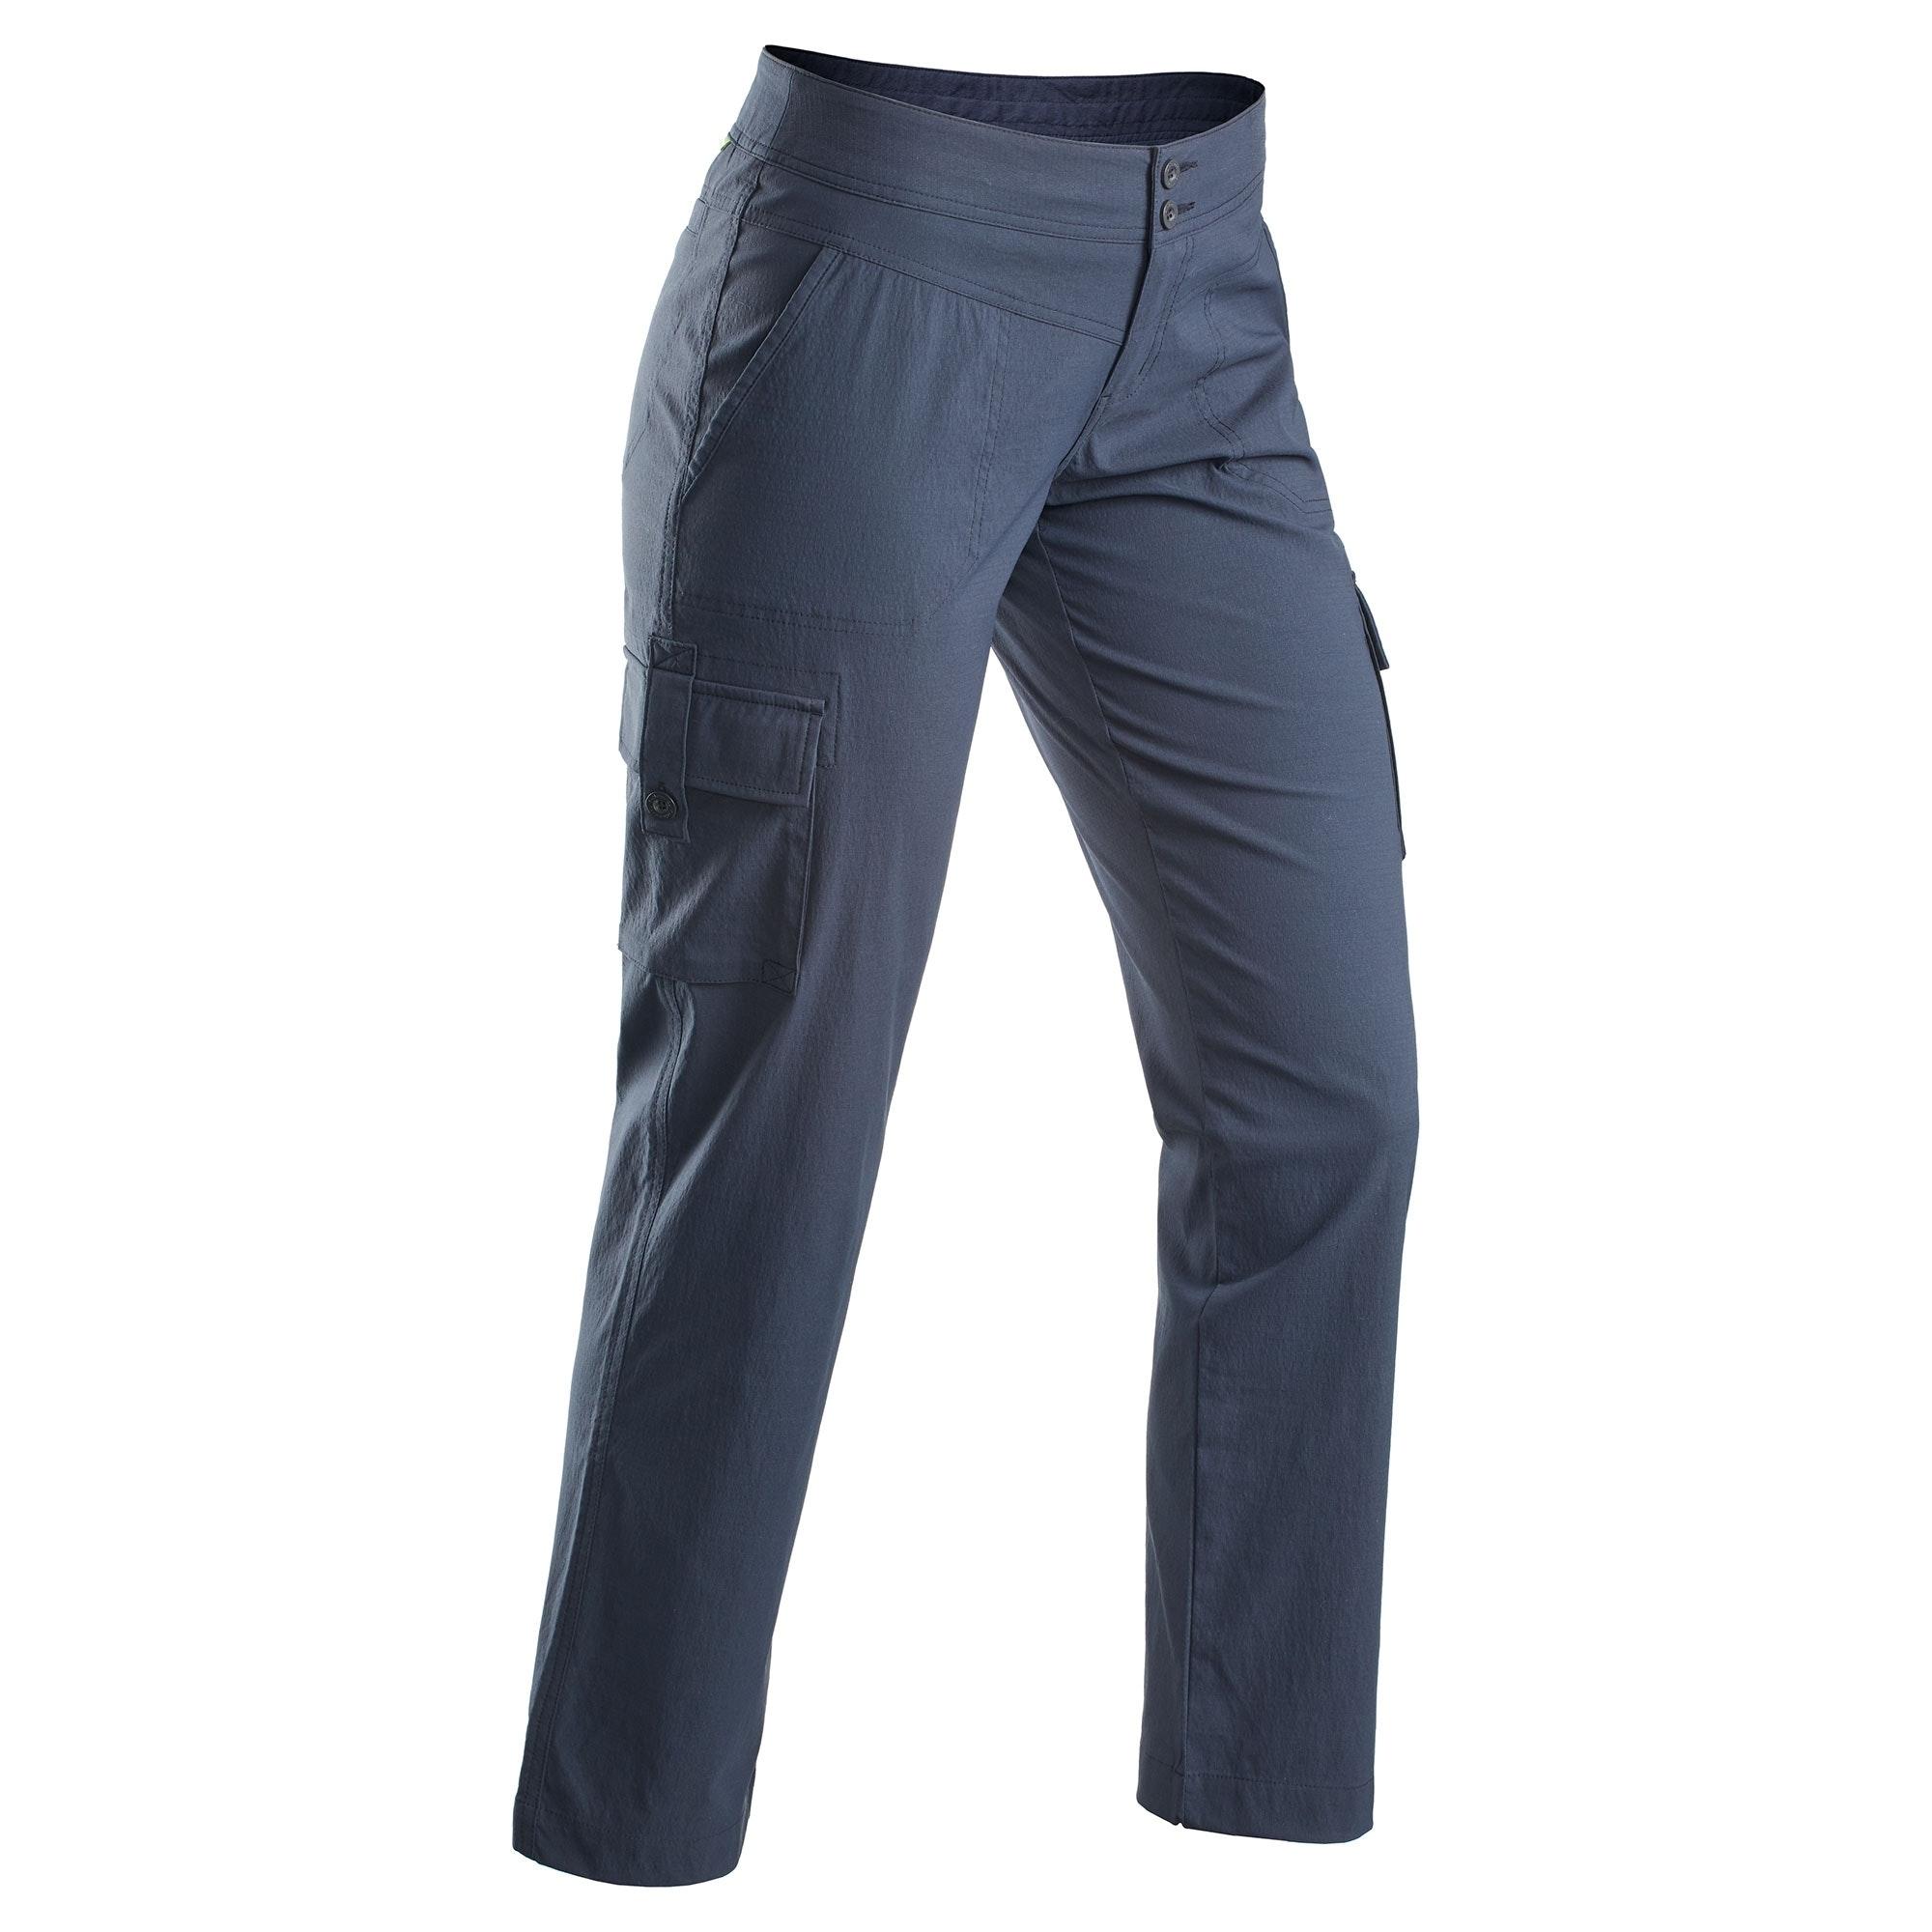 NEW-Kathmandu-Miro-Women-039-s-quickDRY-Pants-Trousers-Stretch-Travel-Cargo-Recycled thumbnail 16